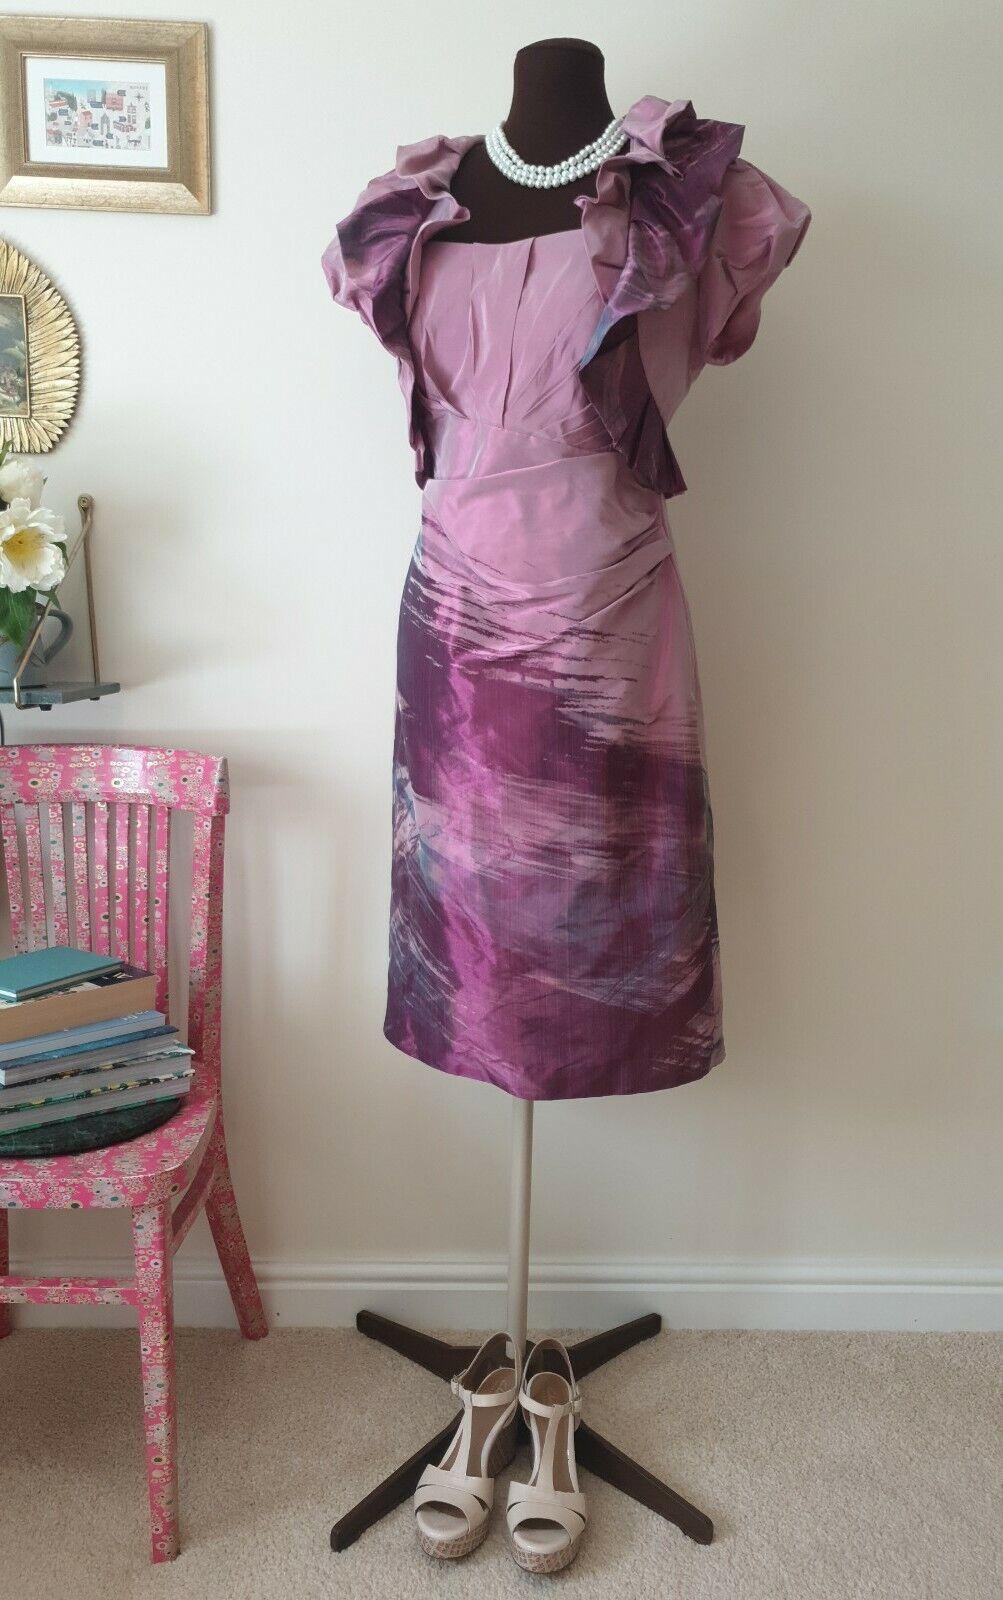 INSPIRATO   UK 14   Pink/Purple Sleeveless Taffeta Dress & Bolero Jacket